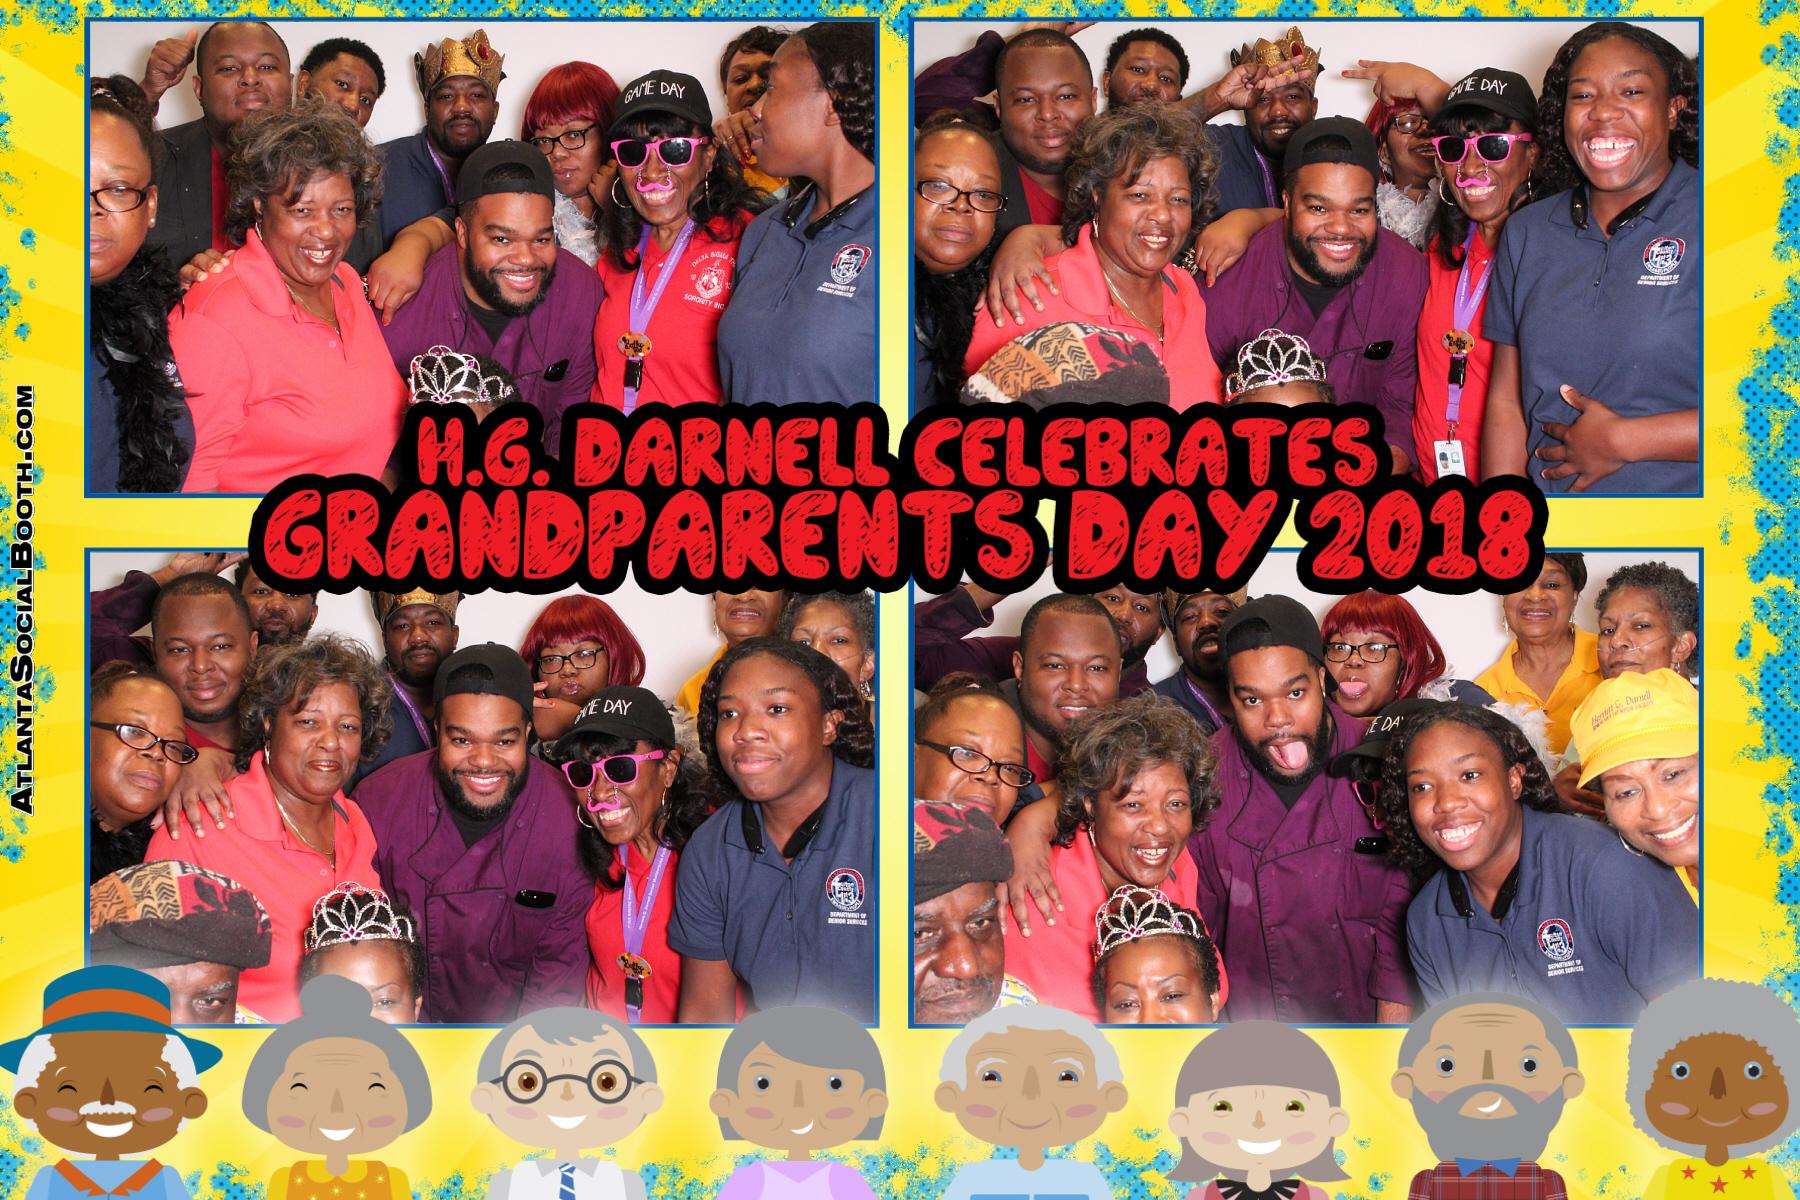 H.G. Darnell Celebrates Grandparents